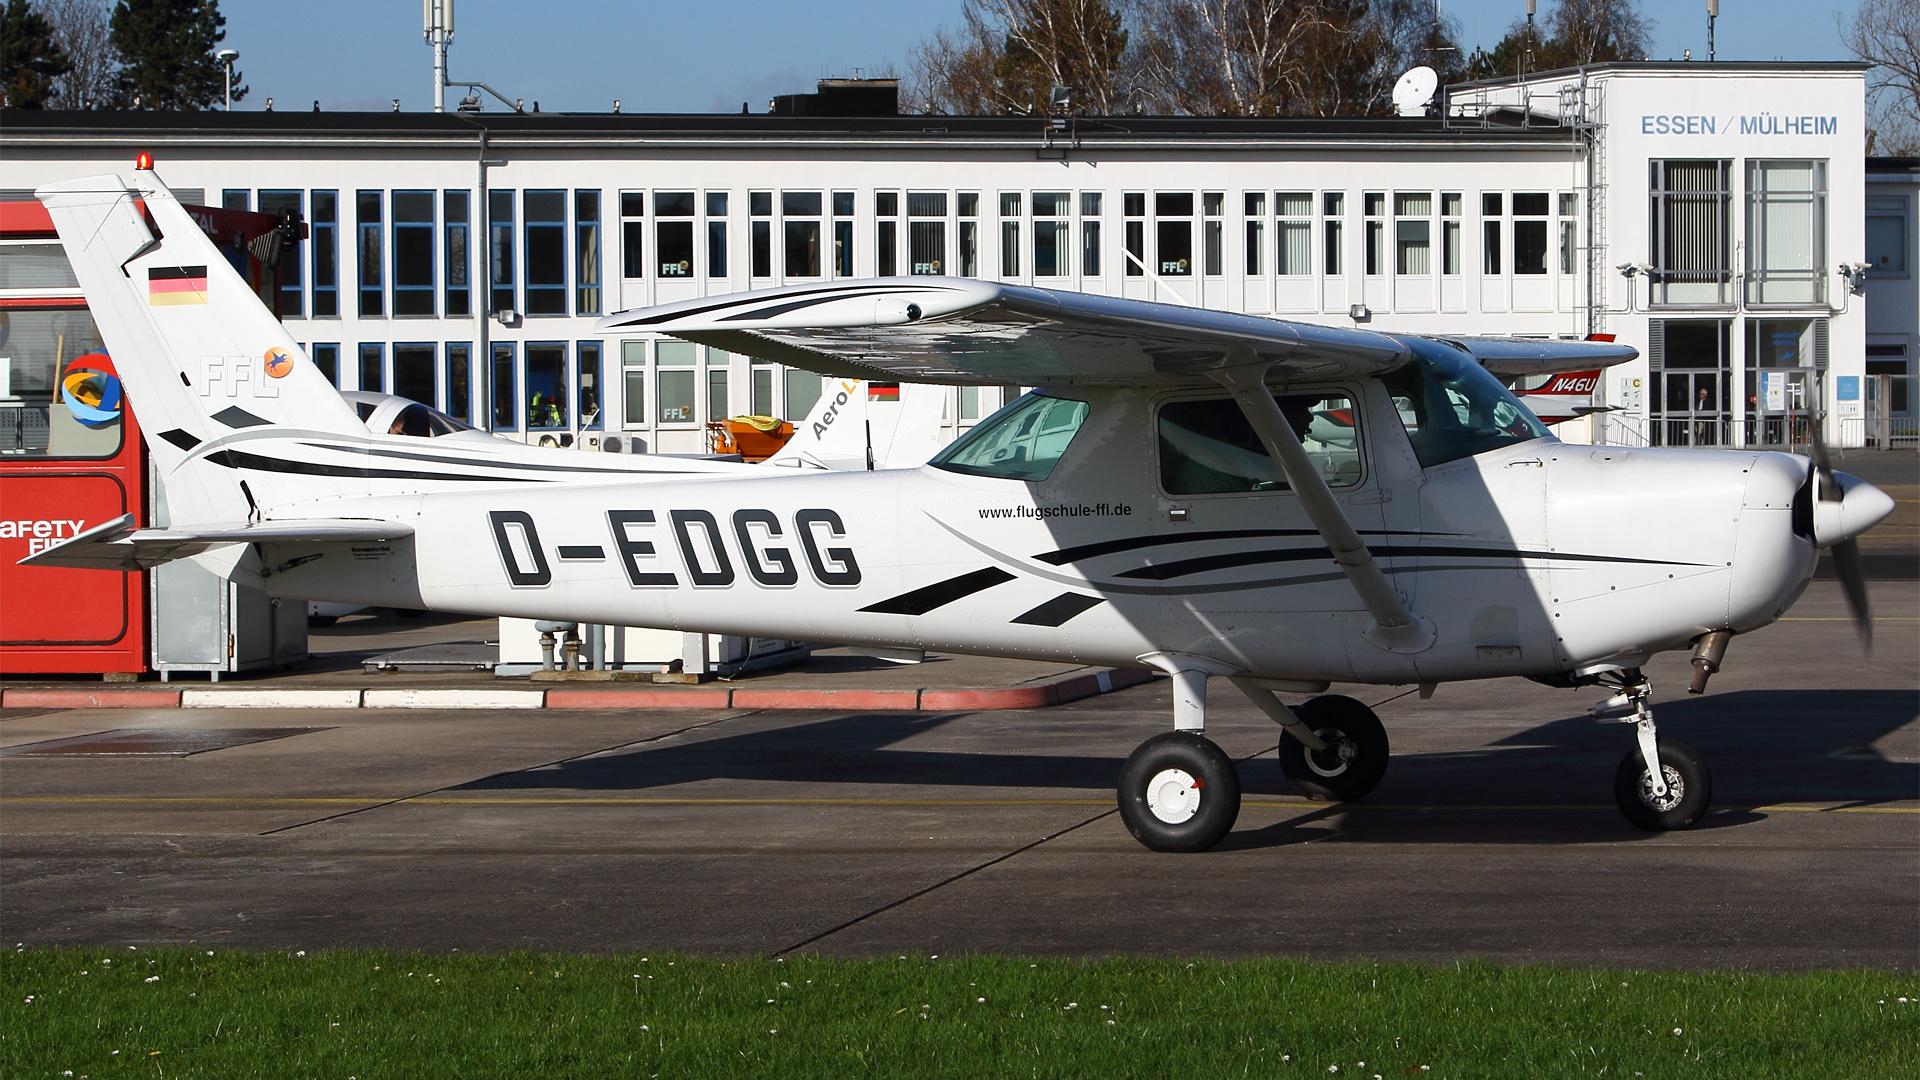 D-EDGG-1 C152 ESS 201411